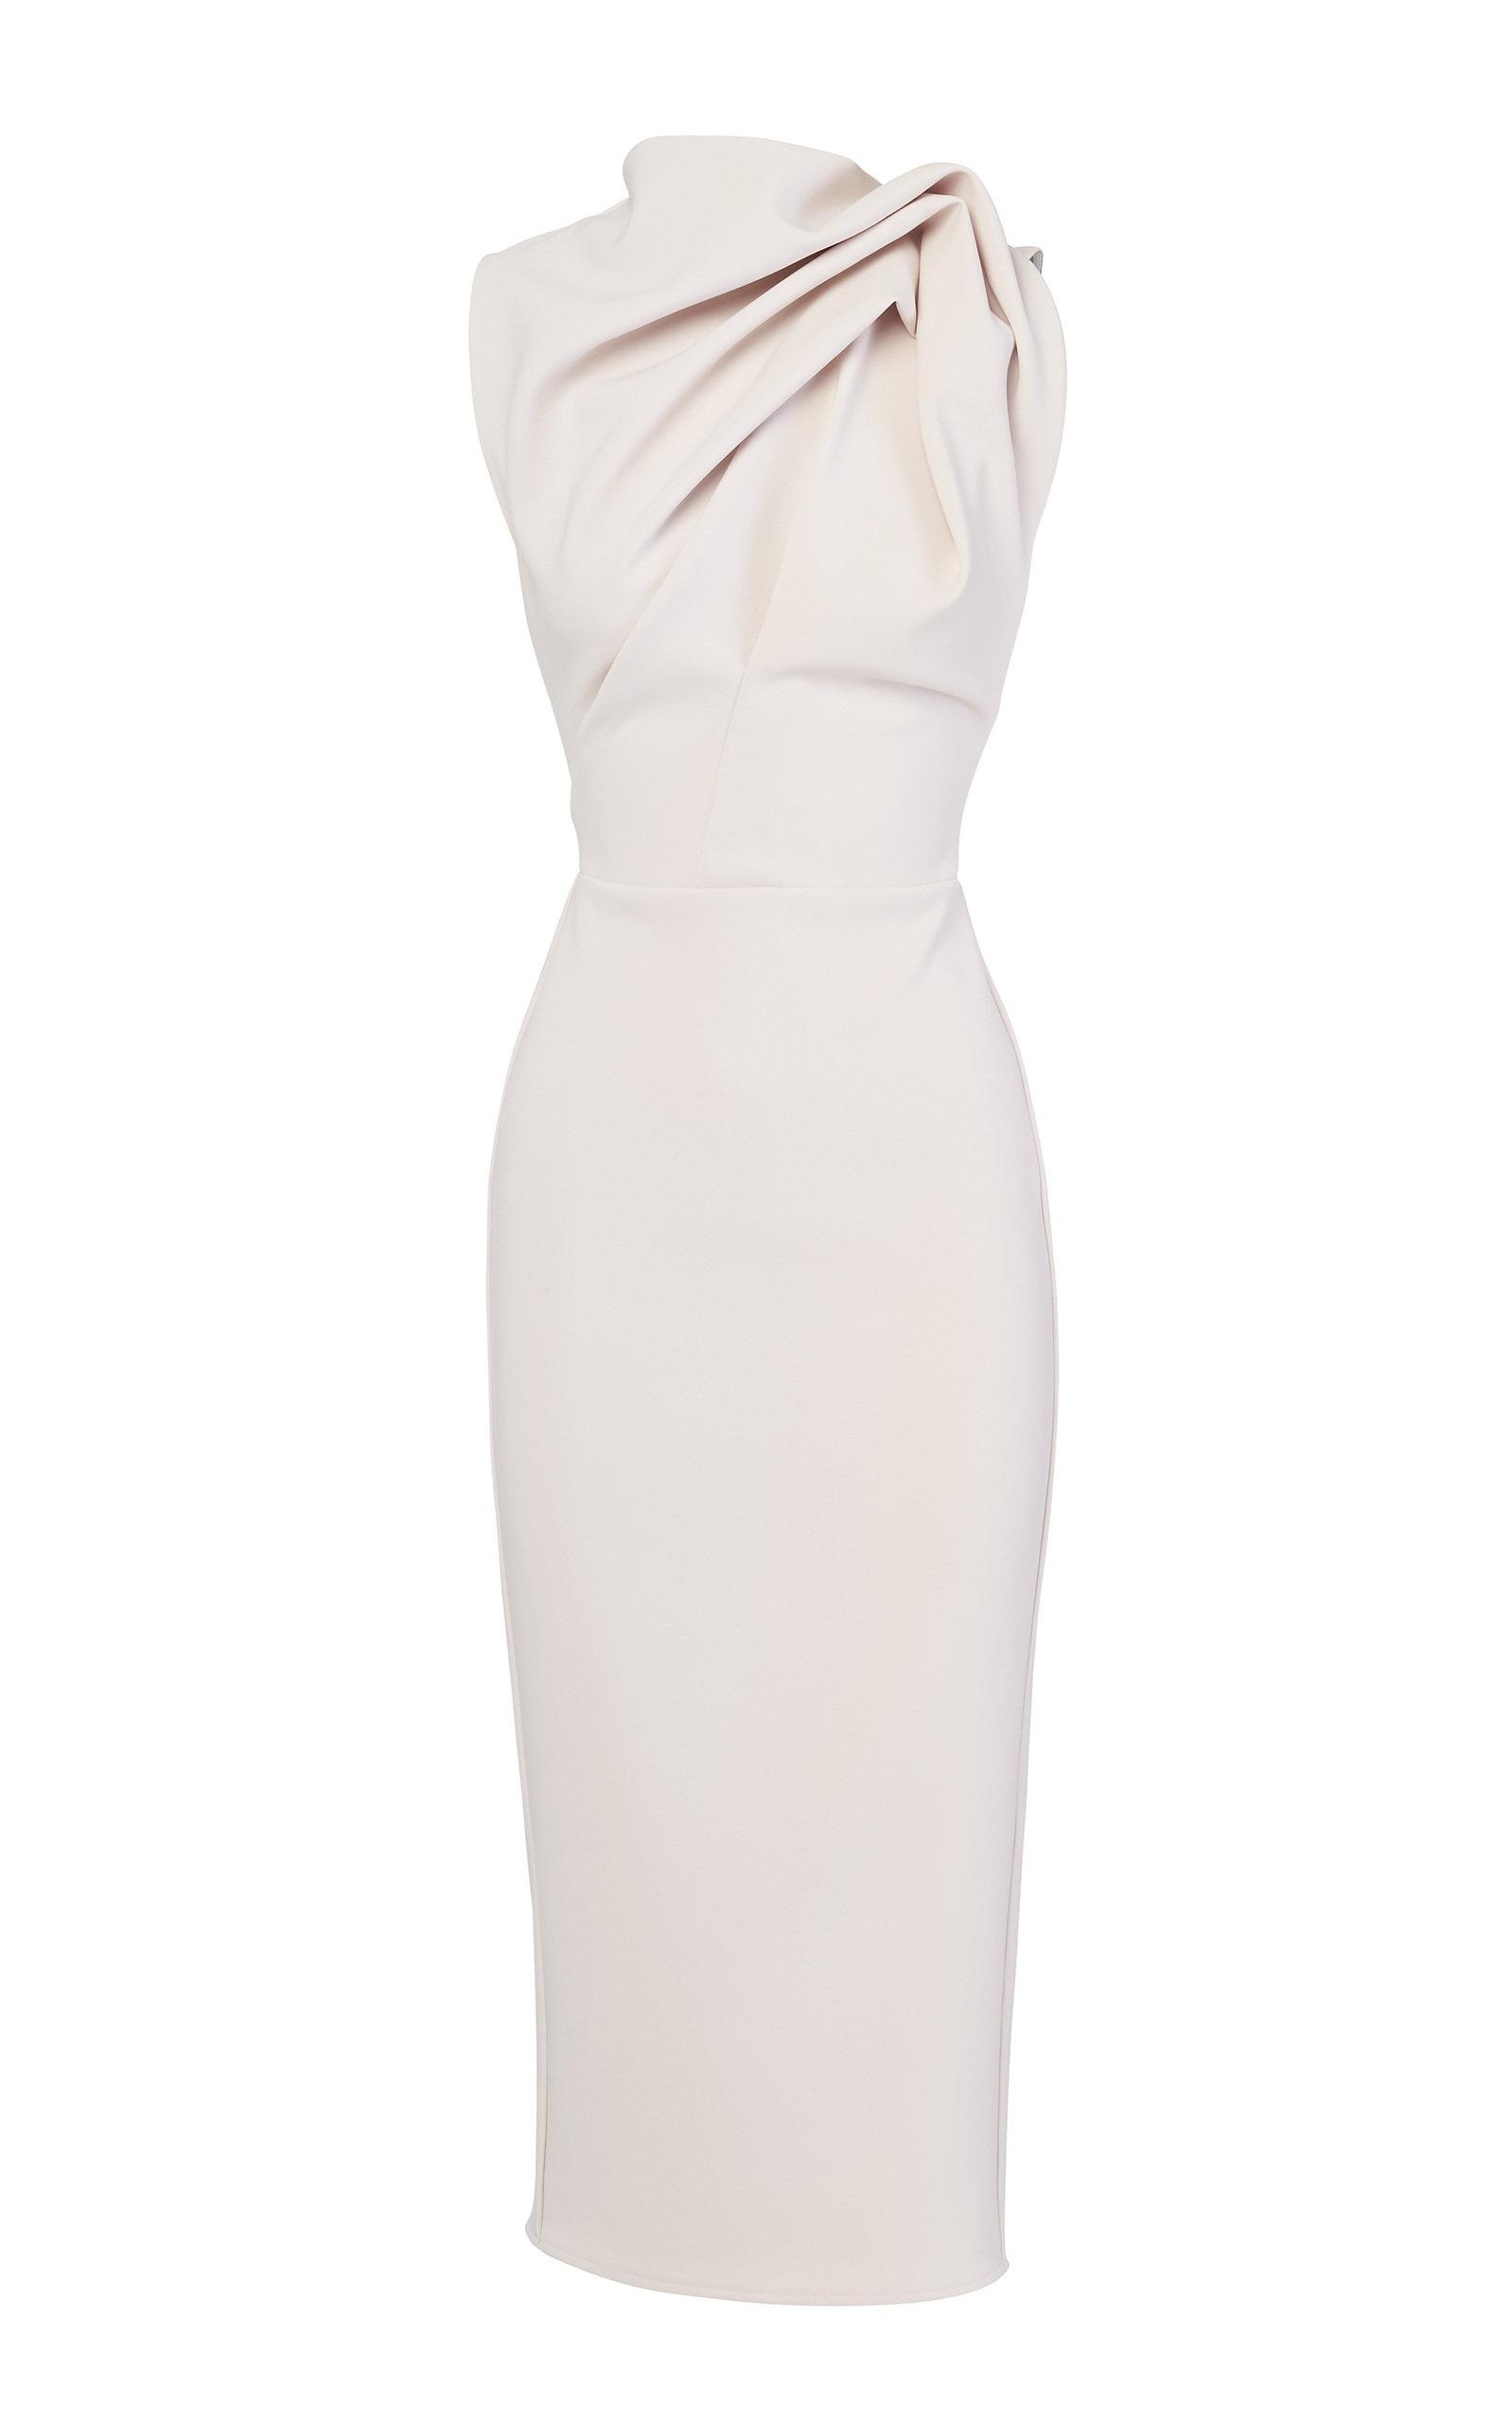 encouraged-crepe-de-chine-dress by maticevski